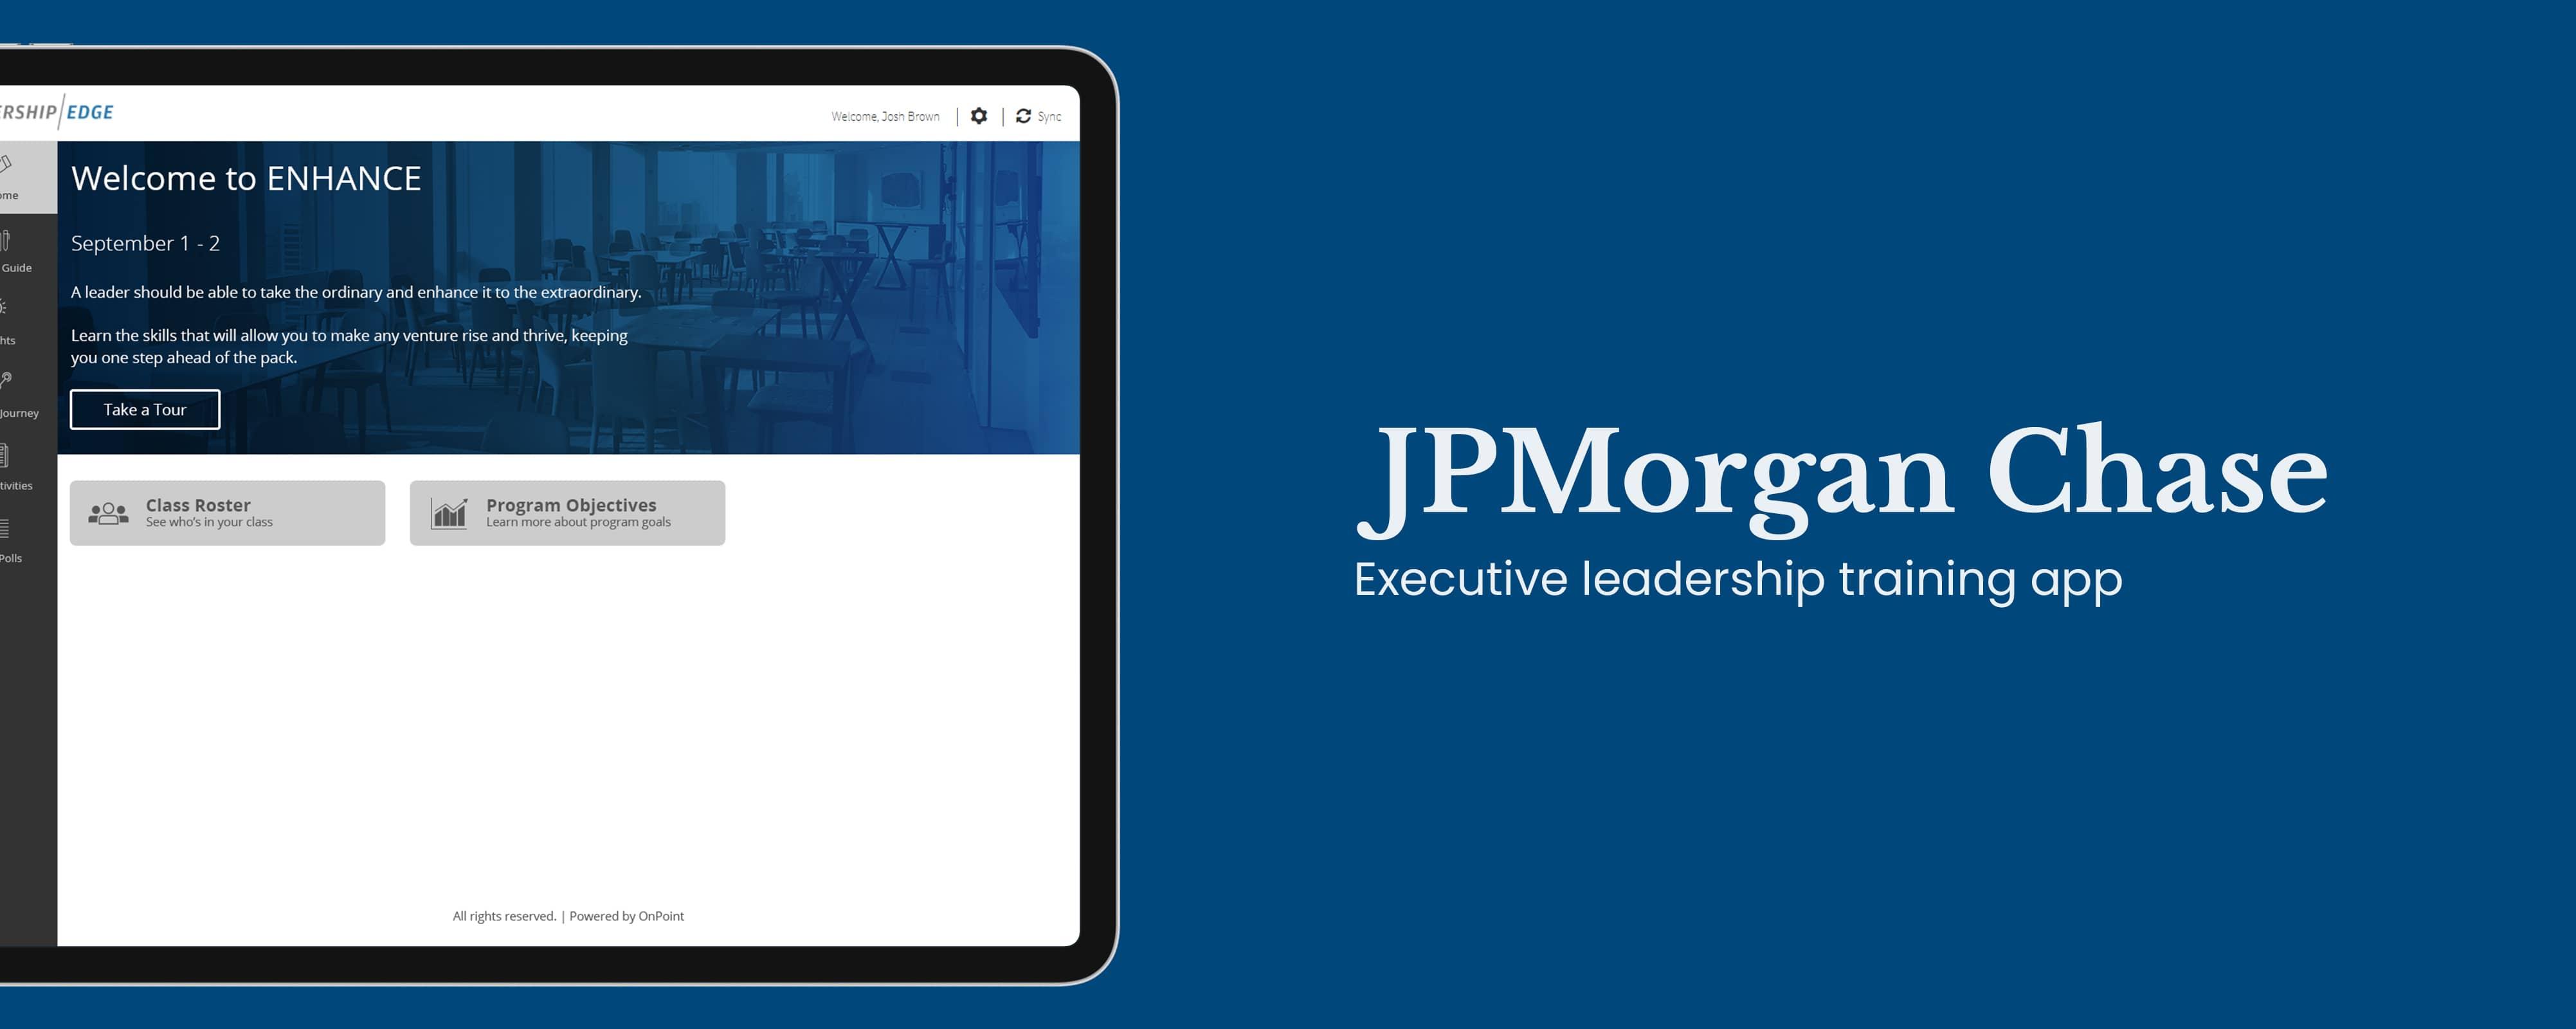 JPMorgan Chase: Executive leadership training app